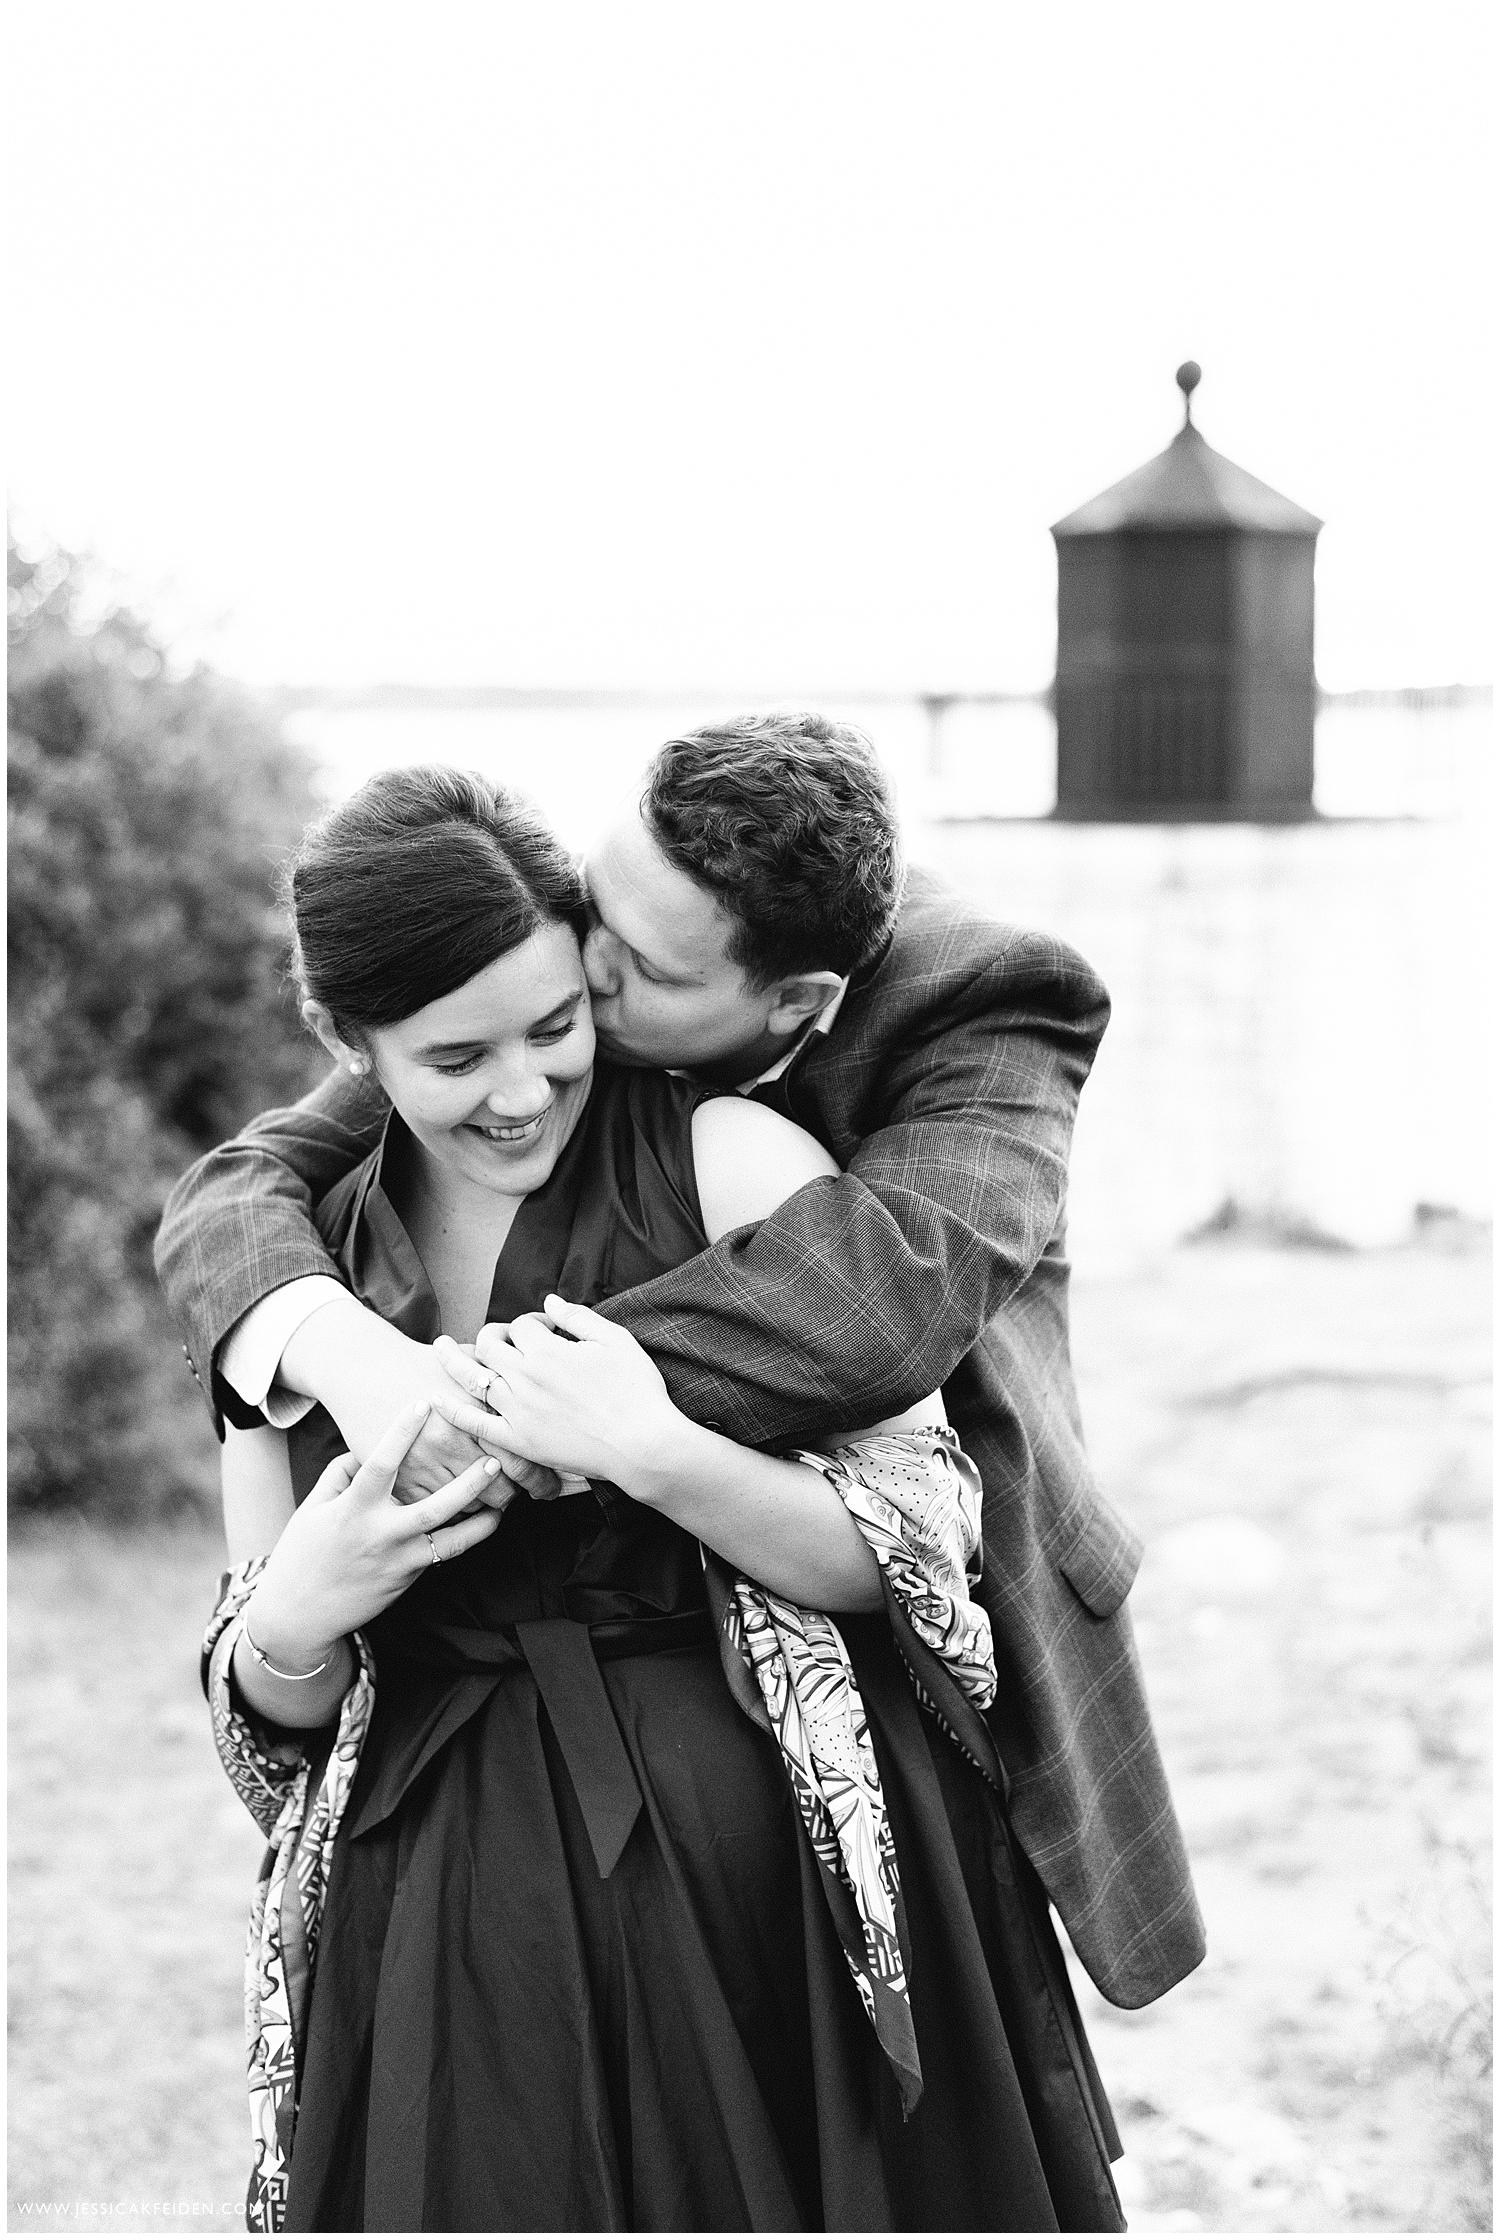 Jessica K Feiden Photography_Castle Hill Lighthouse Newport Engagement Session Photographer_0010.jpg